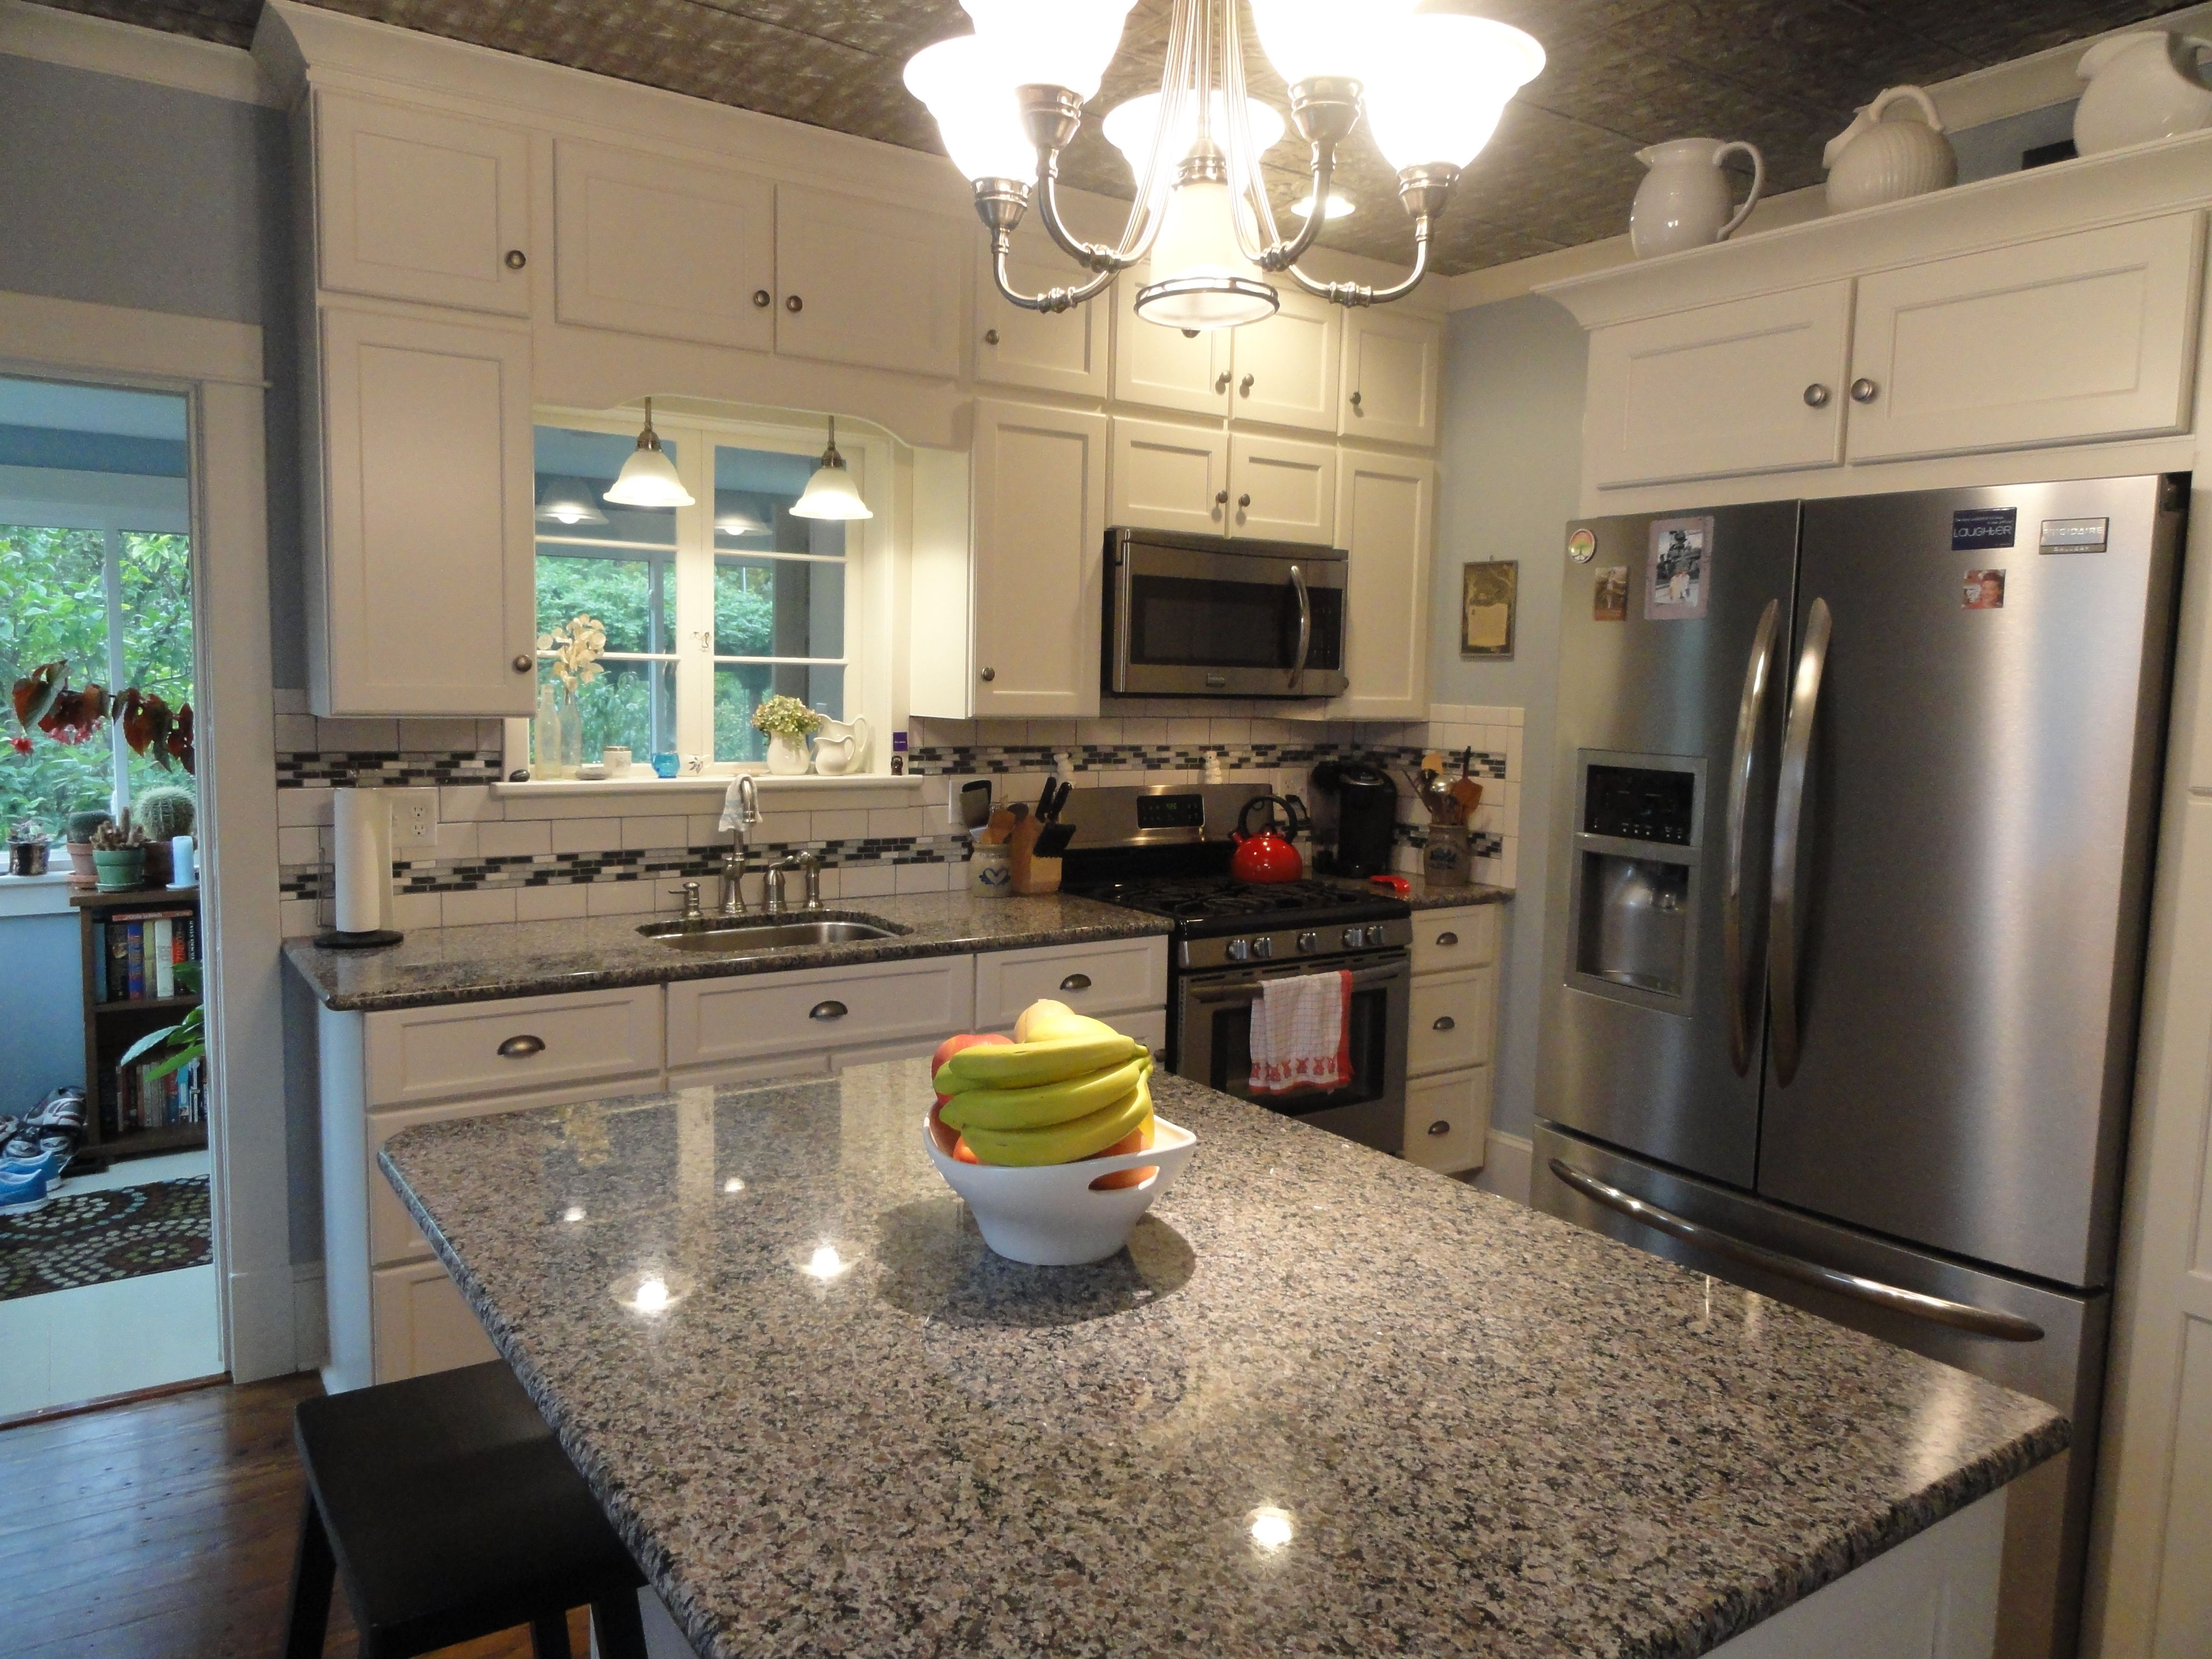 Granit Kitchen 17 Best Ideas About Caledonia Granite On Pinterest Small Granite